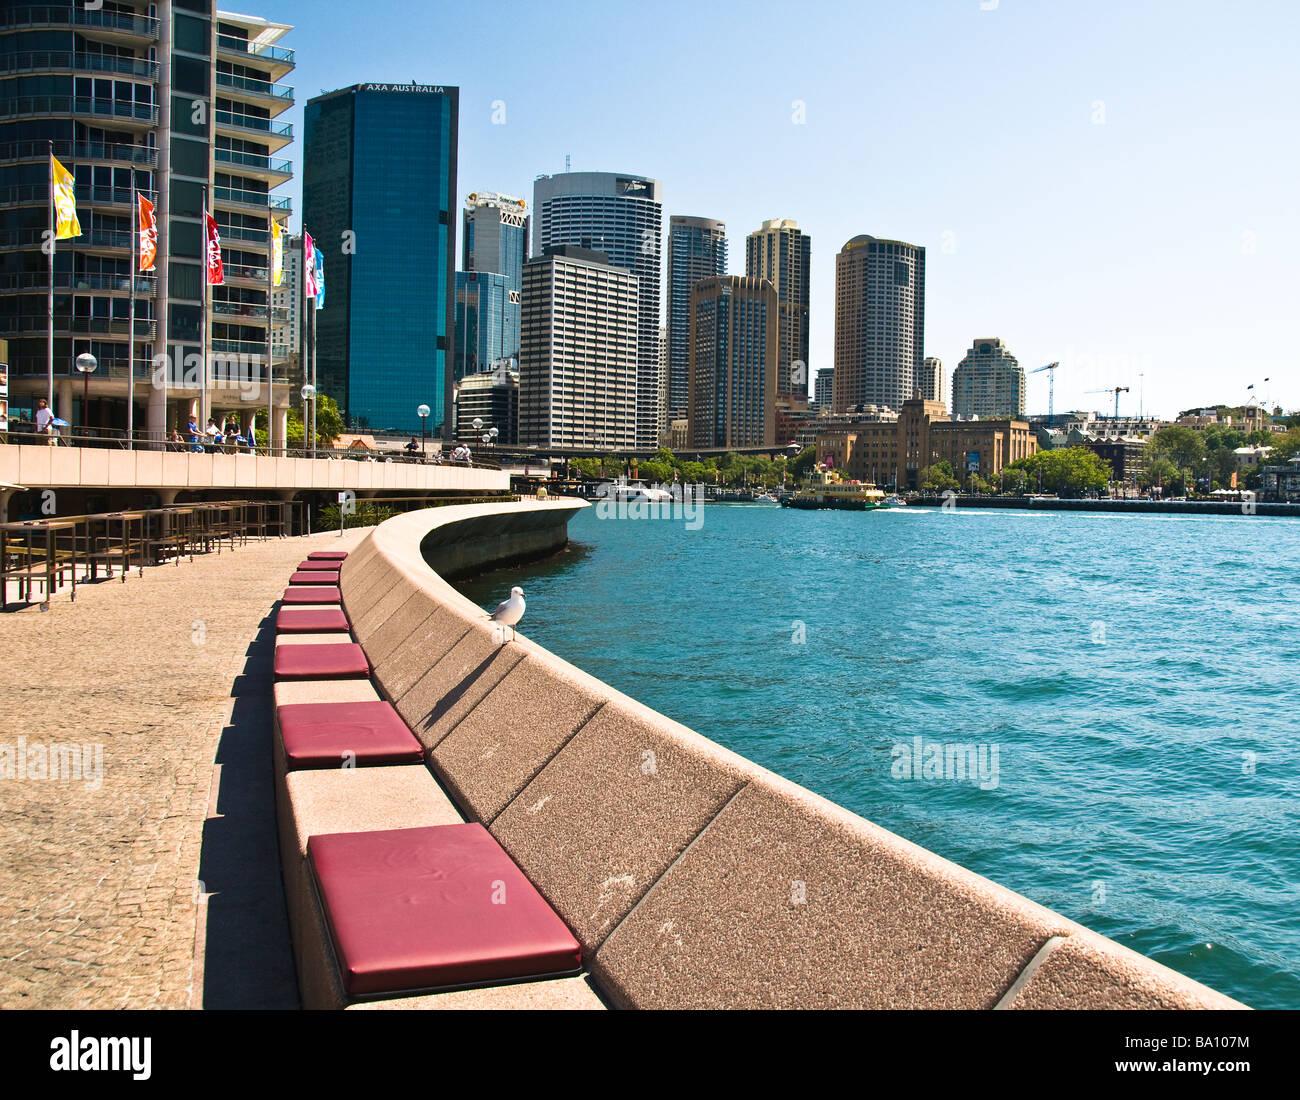 Sydney skyline Circular Quay NSW Australia - Stock Image